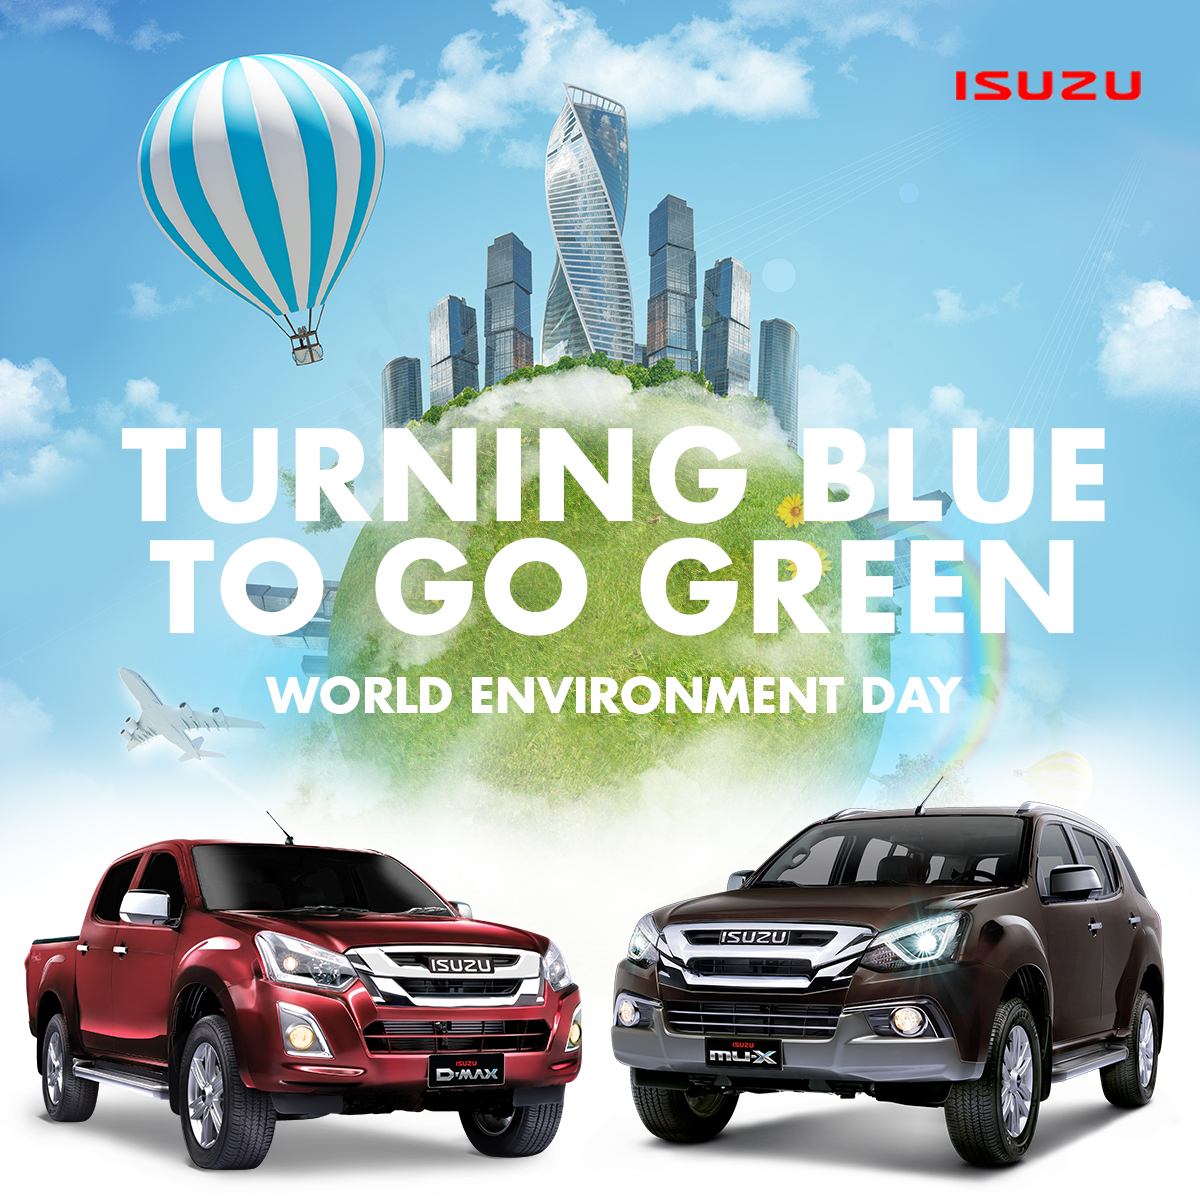 isuzu_go_green_FA.jpg